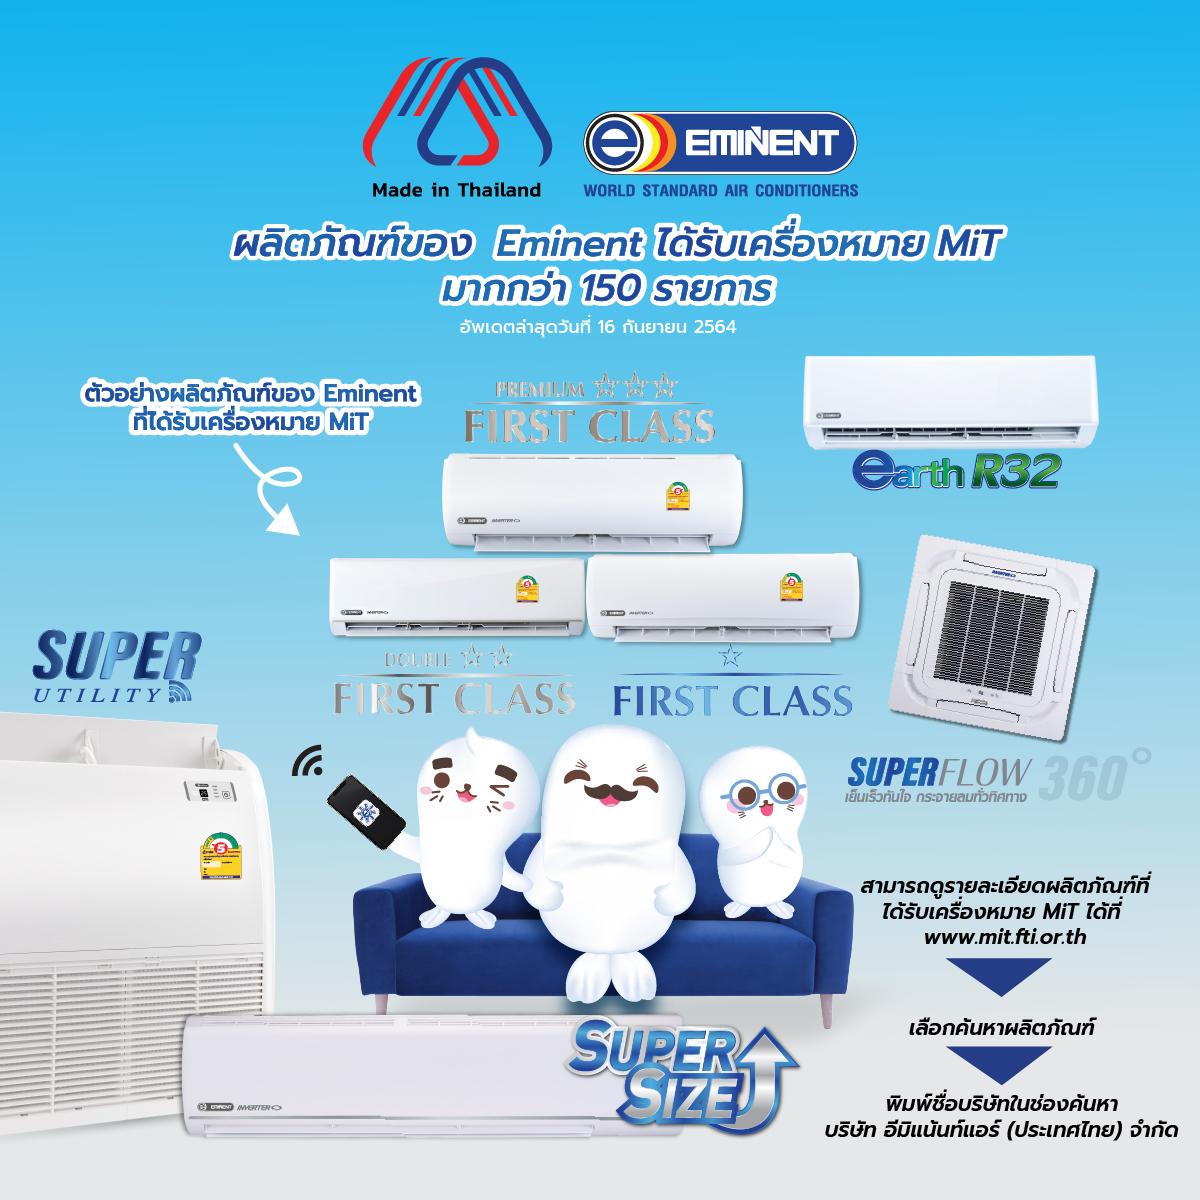 Eminent Air กับการรับรองสินค้าที่ผลิตในประเทศไทย (Made in Thailand)